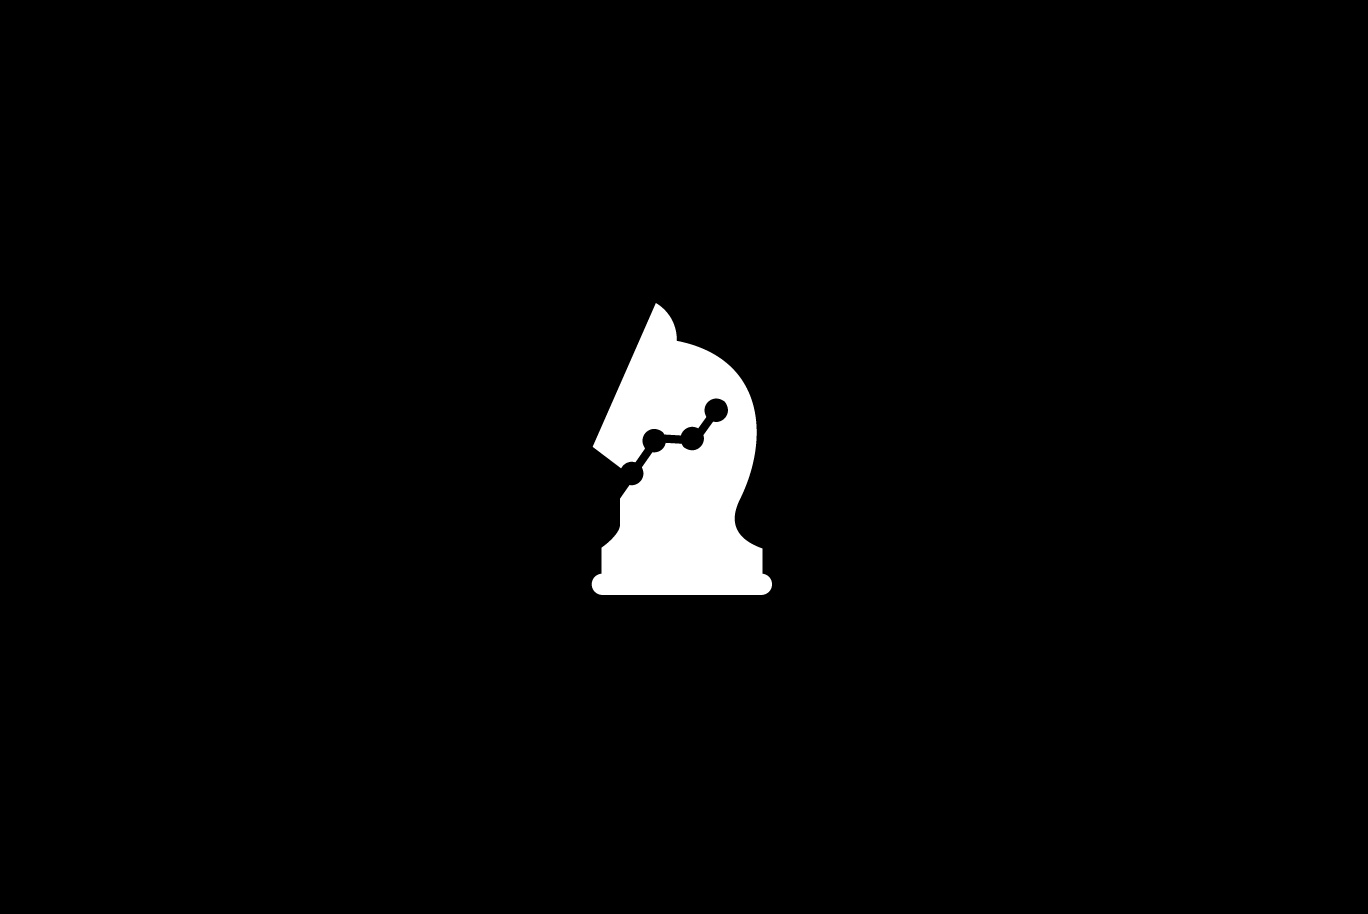 strategy analytics chess knight logo � sold logo cowboy